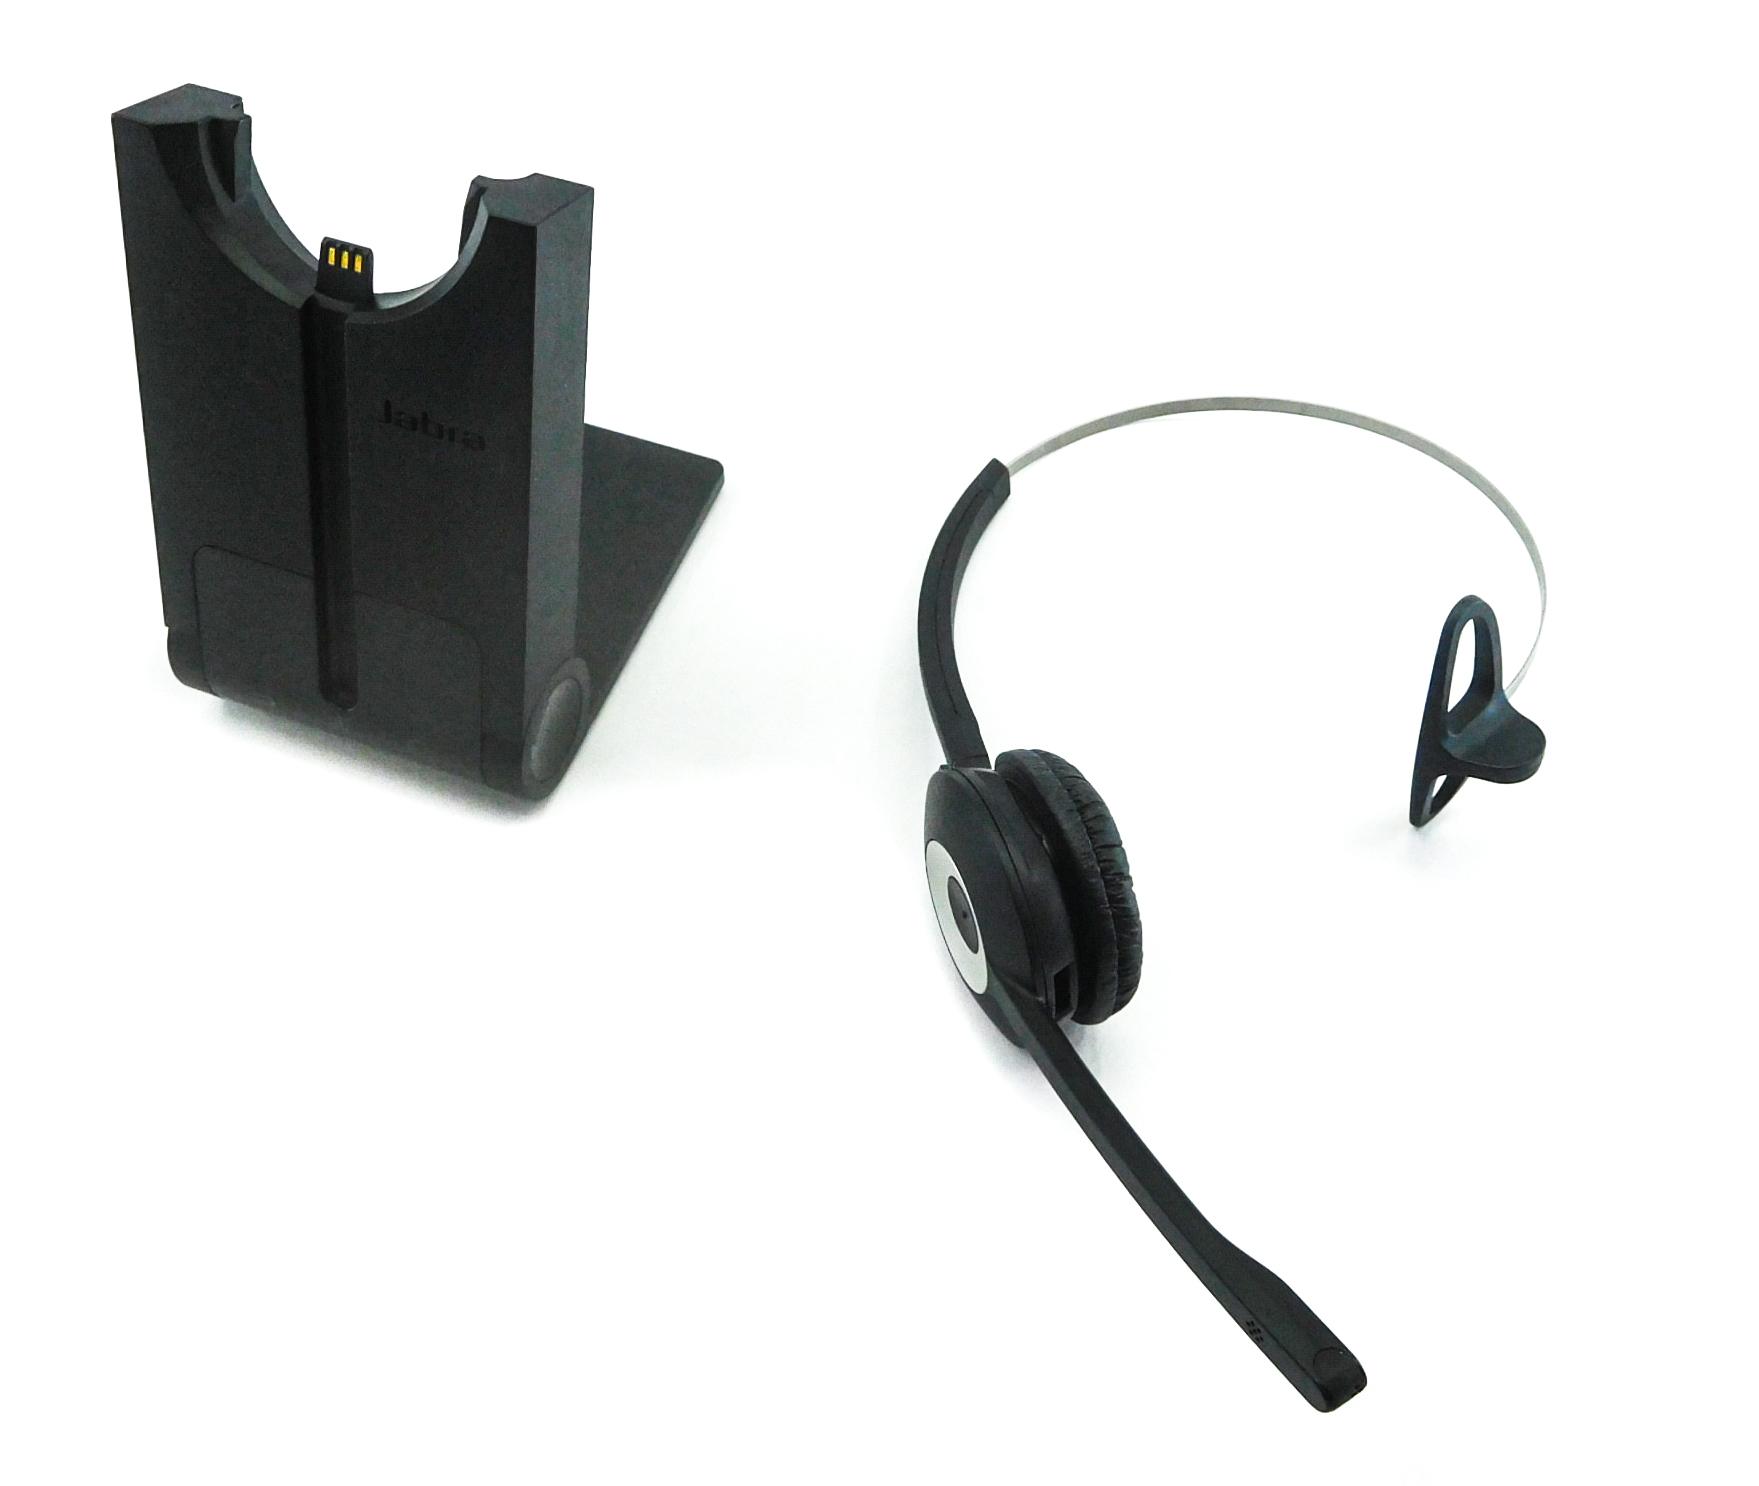 Jabra PRO 930 UK Wireless Headset DECT System w/ WHB003 Base Station No PSU